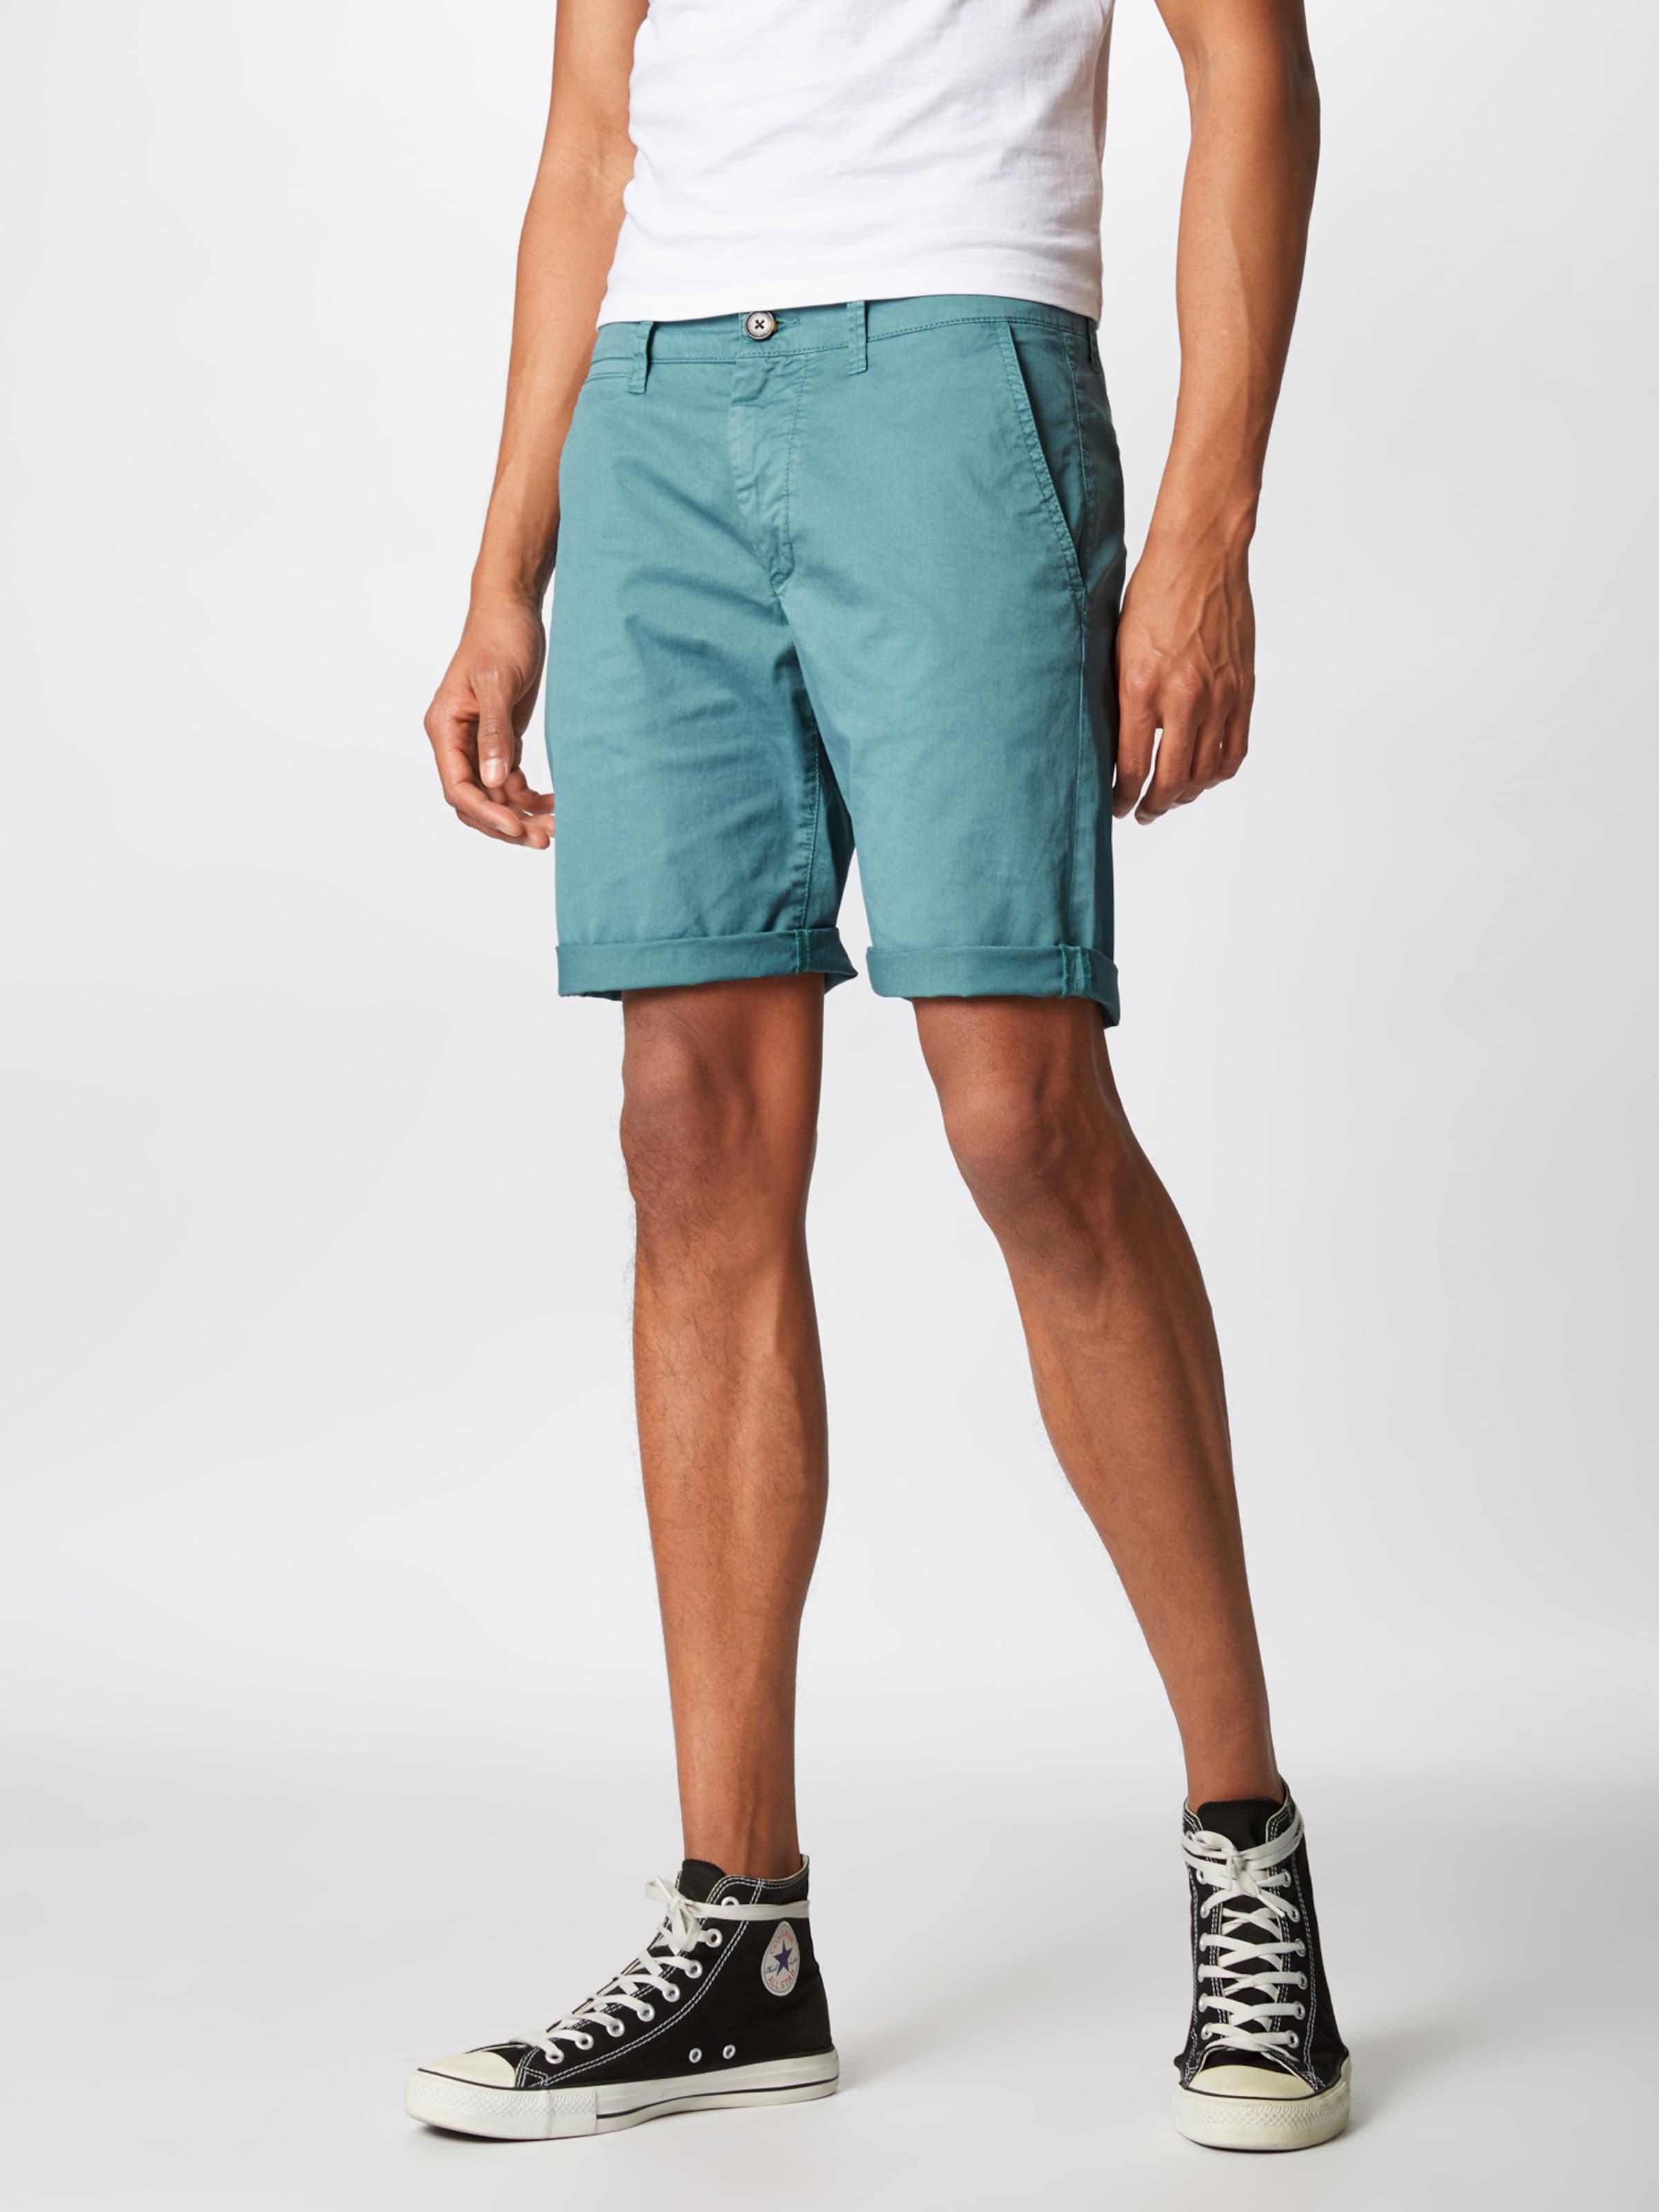 Pepe 'mc Jeans Queen' Pantalon En Pétrole 5jcRL34Aq